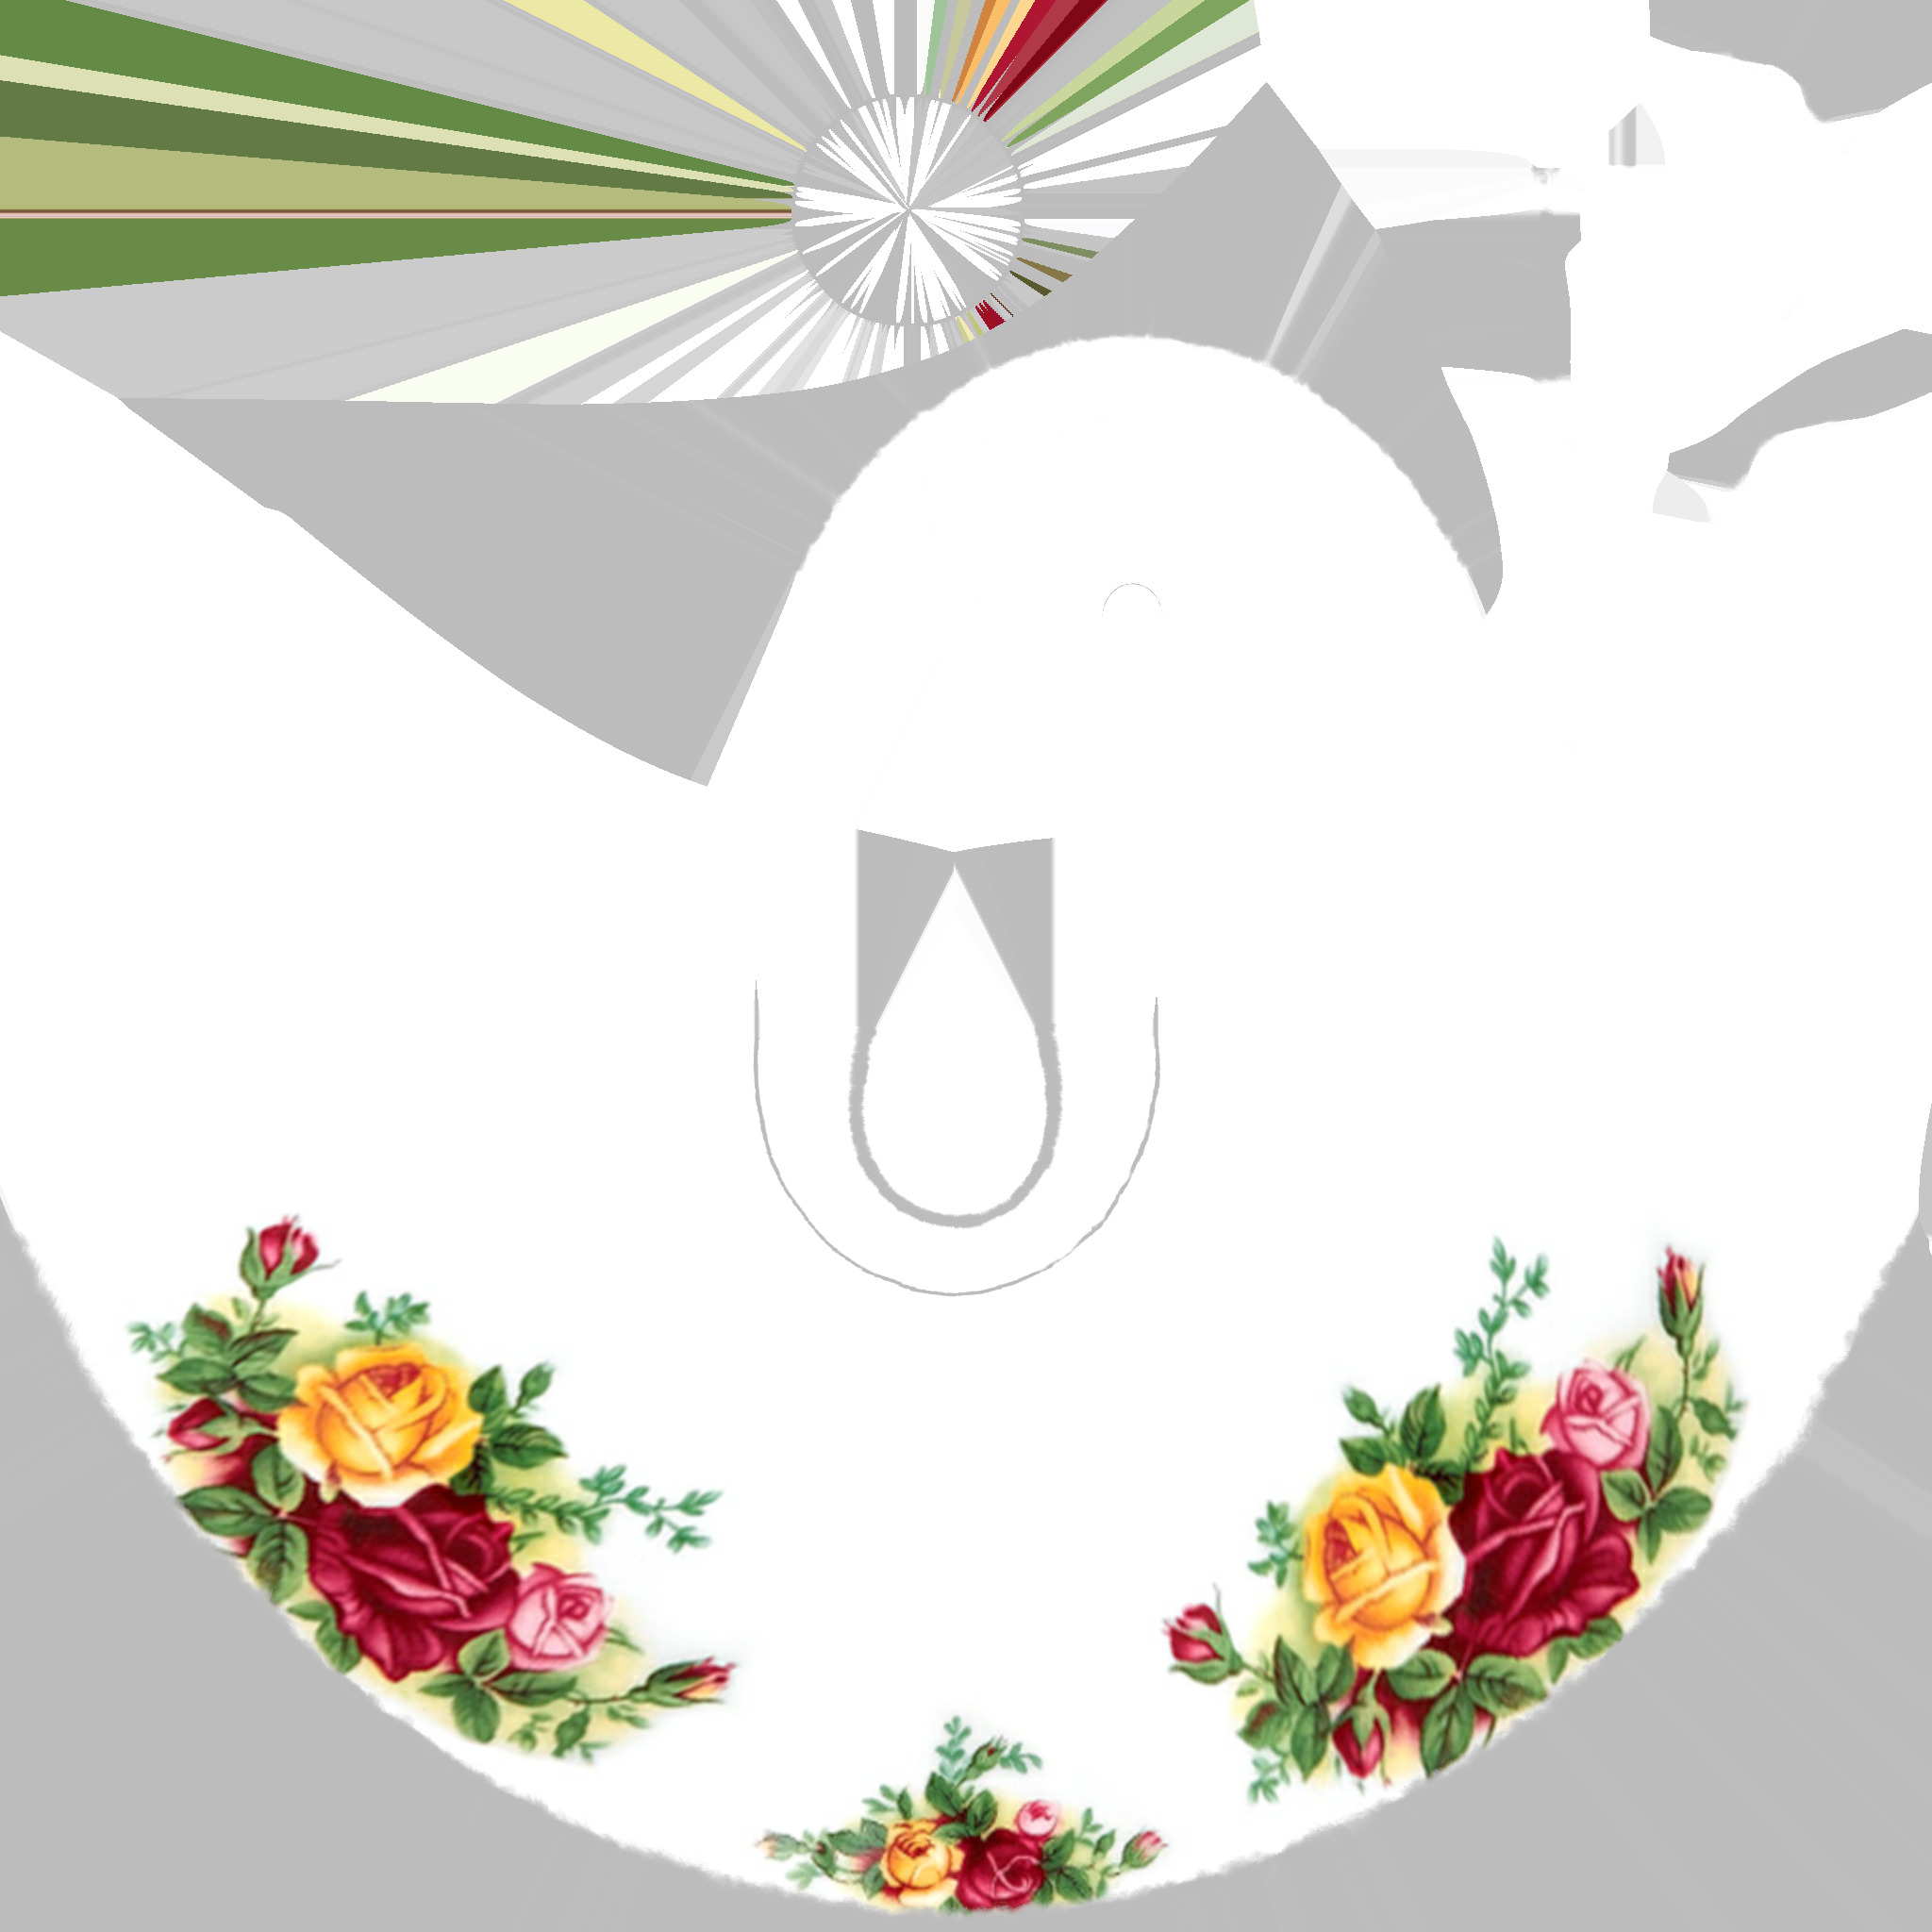 Substance Painter Logo Png (37+ images).